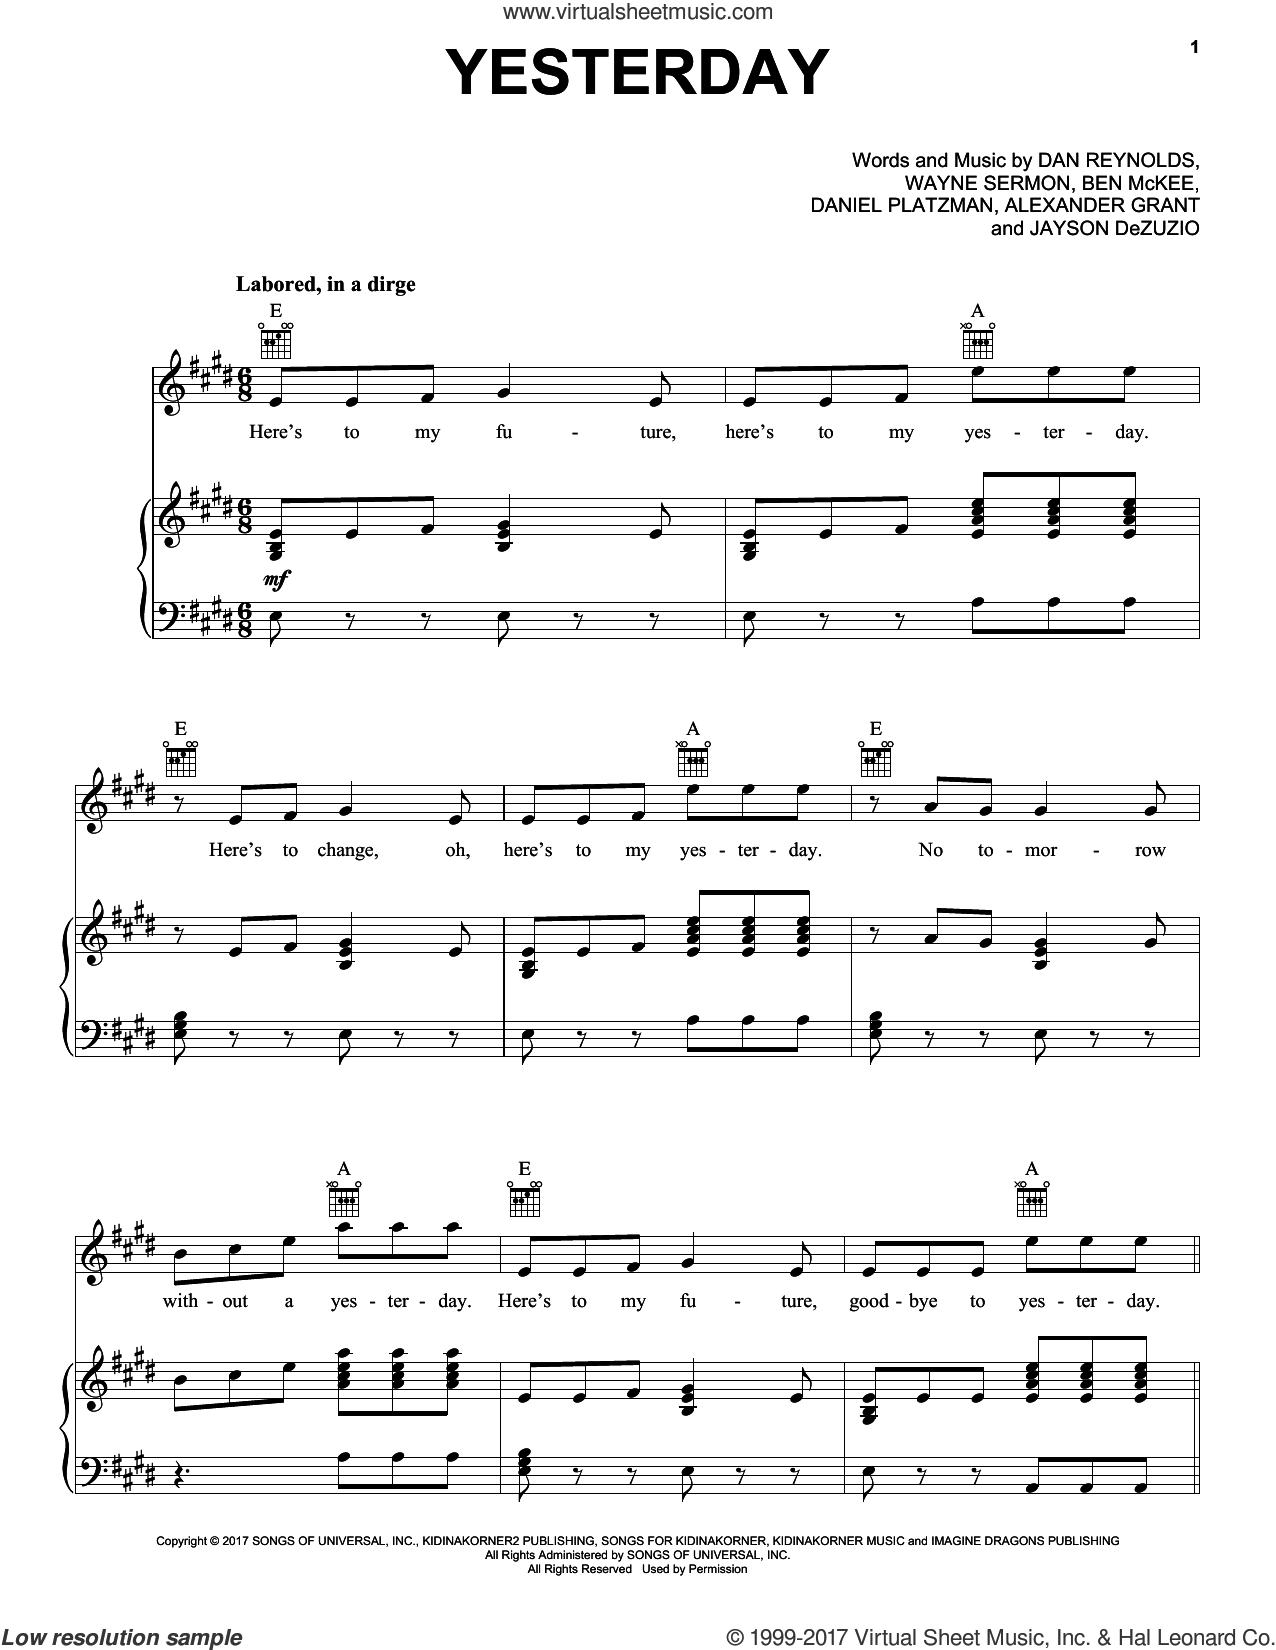 Yesterday sheet music for voice, piano or guitar by Imagine Dragons, Alexander Grant, Ben McKee, Dan Reynolds, Daniel Platzman, Jayson Dezuzio and Wayne Sermon, intermediate skill level